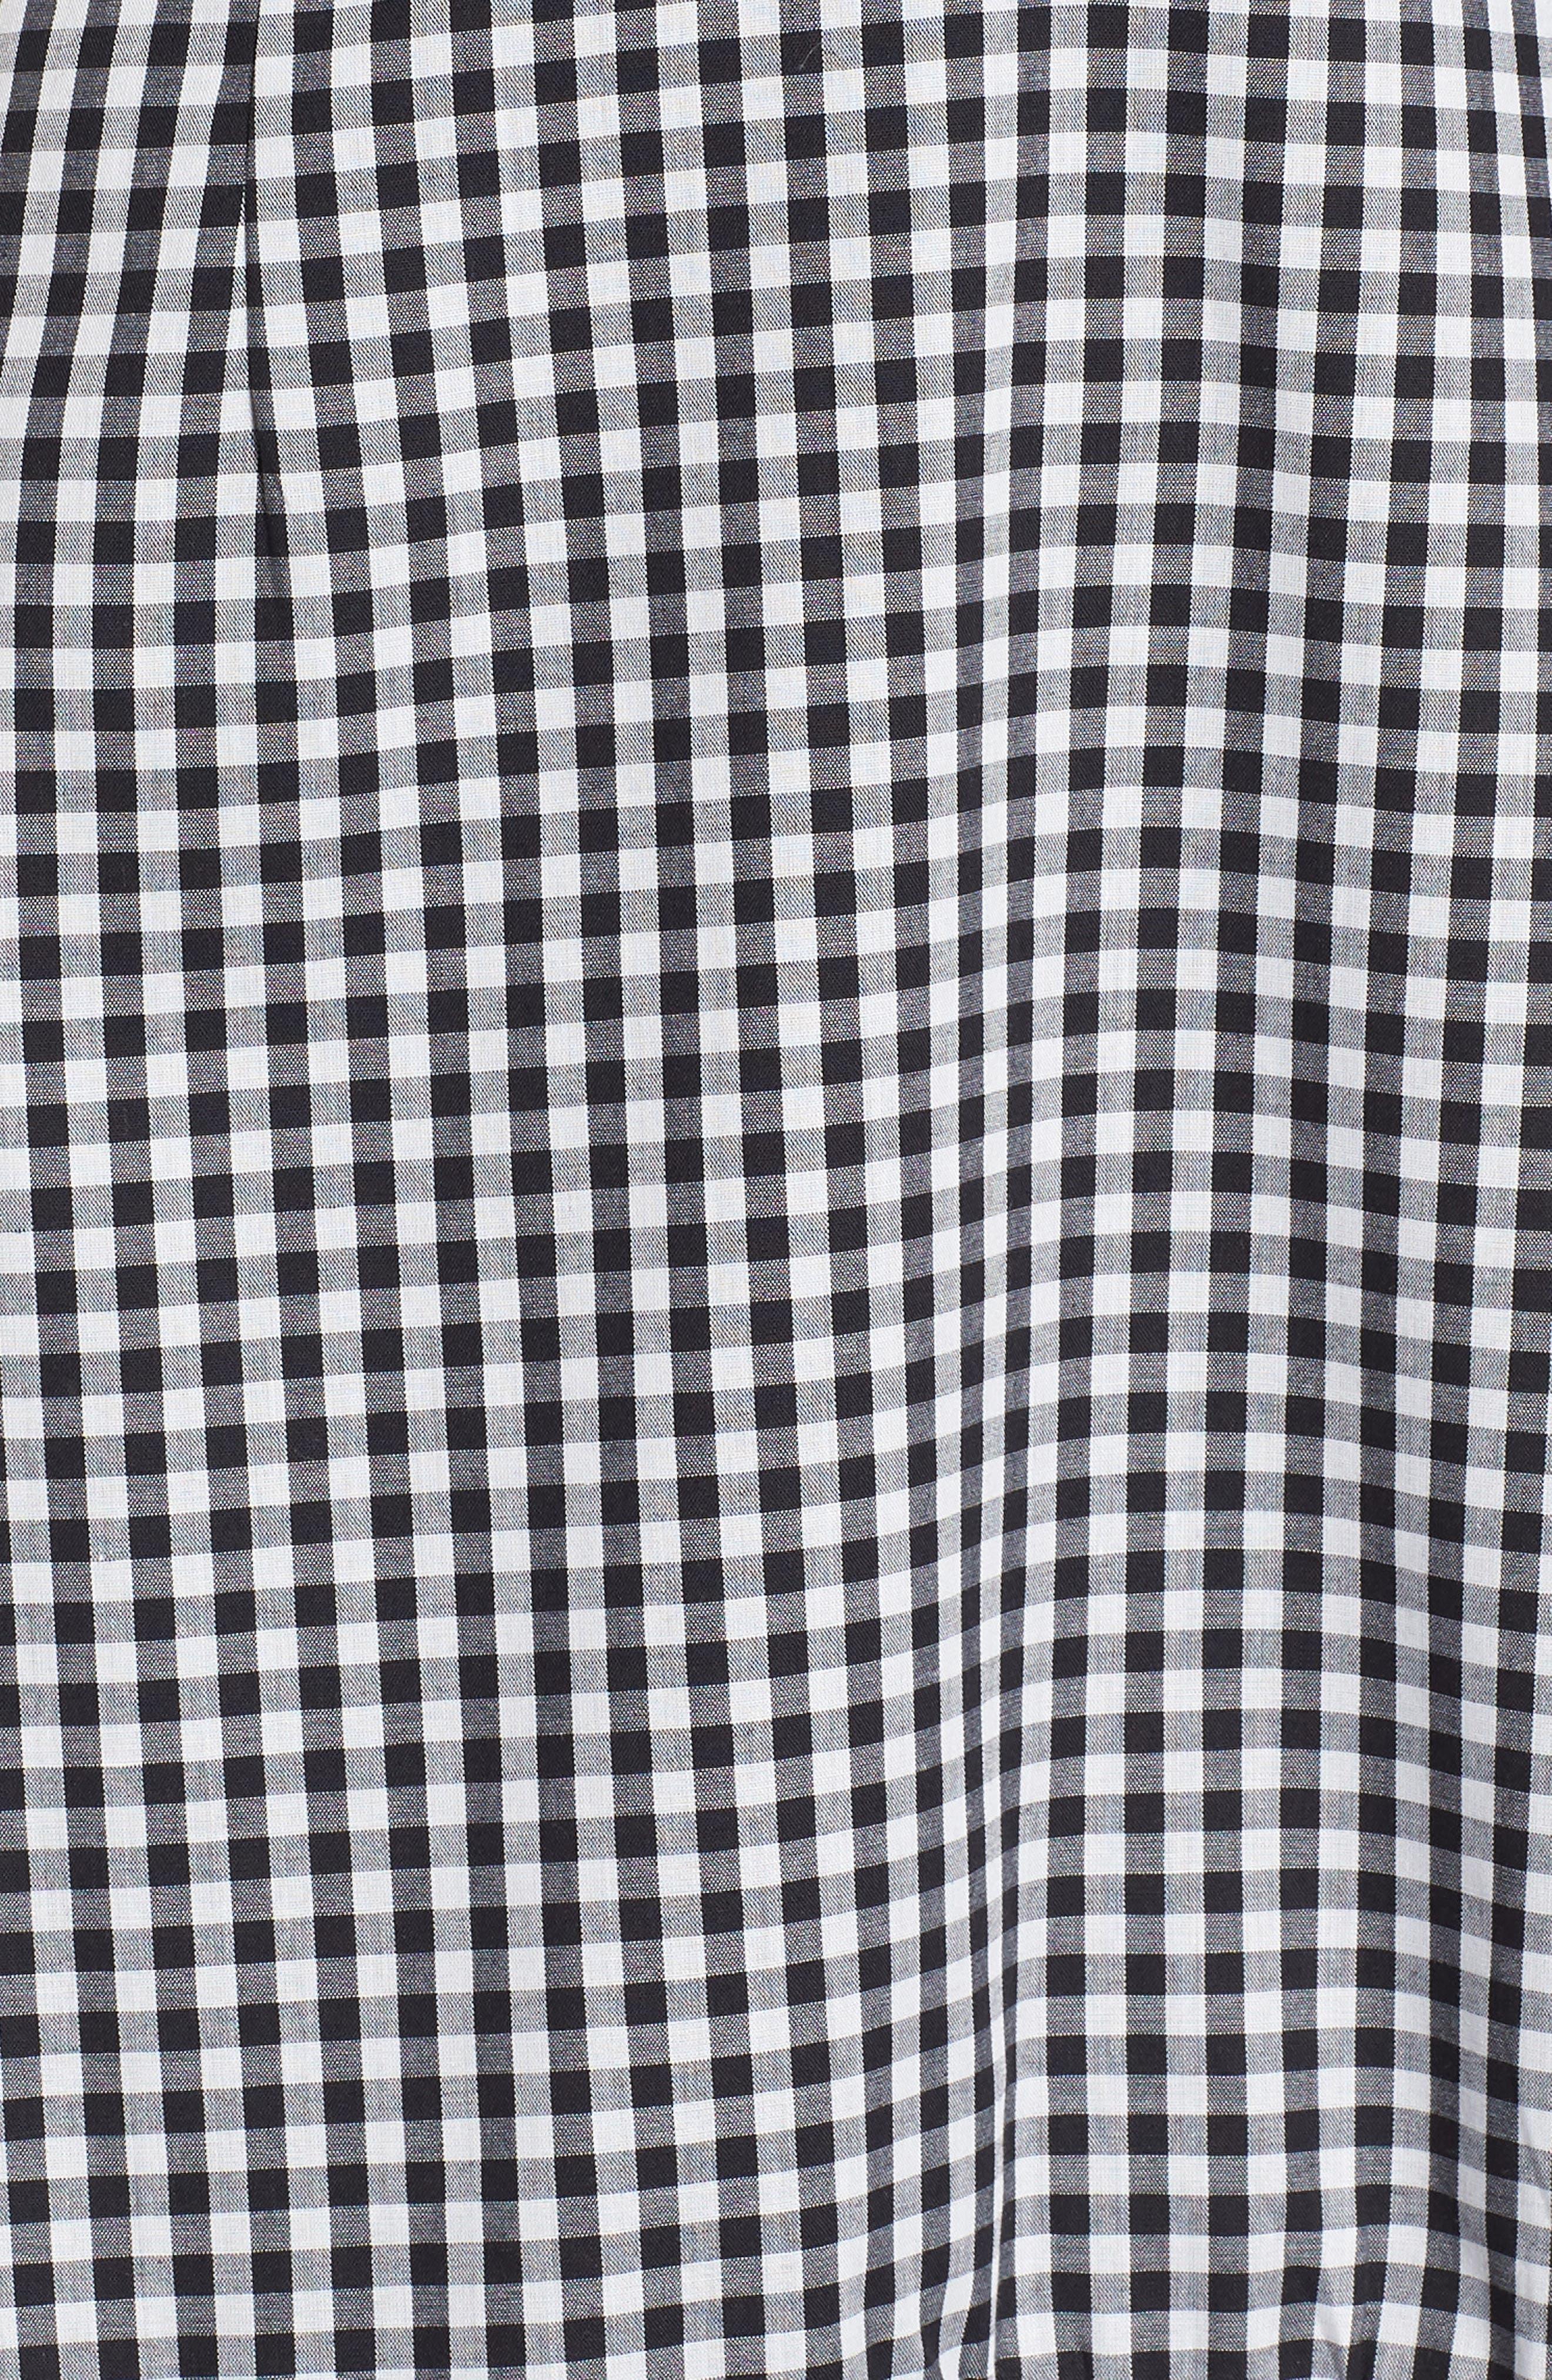 Zander Ruffle Midi Dress,                             Alternate thumbnail 5, color,                             001